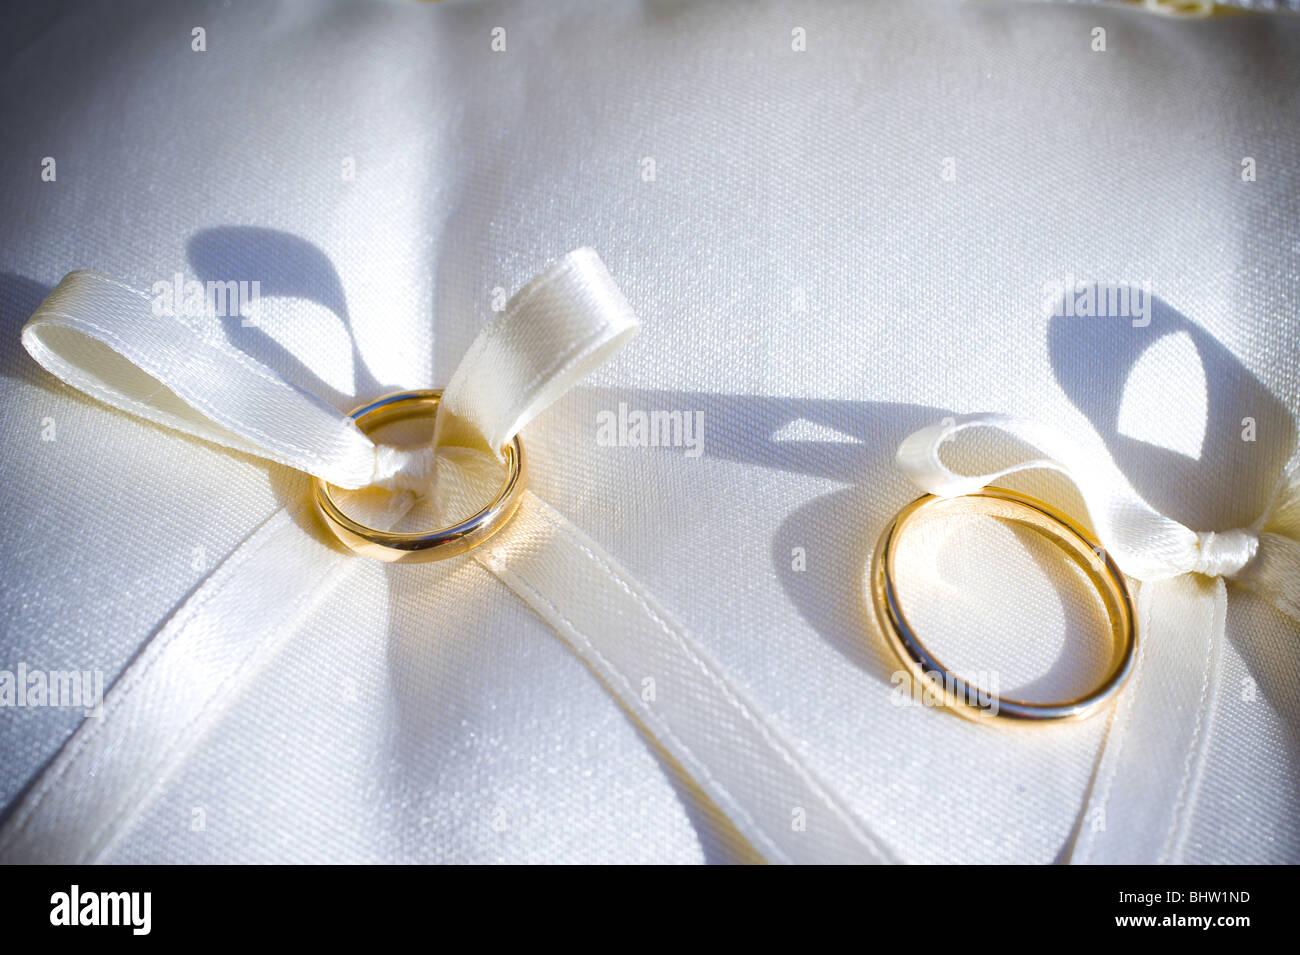 Wedding rings, close-up - Stock Image